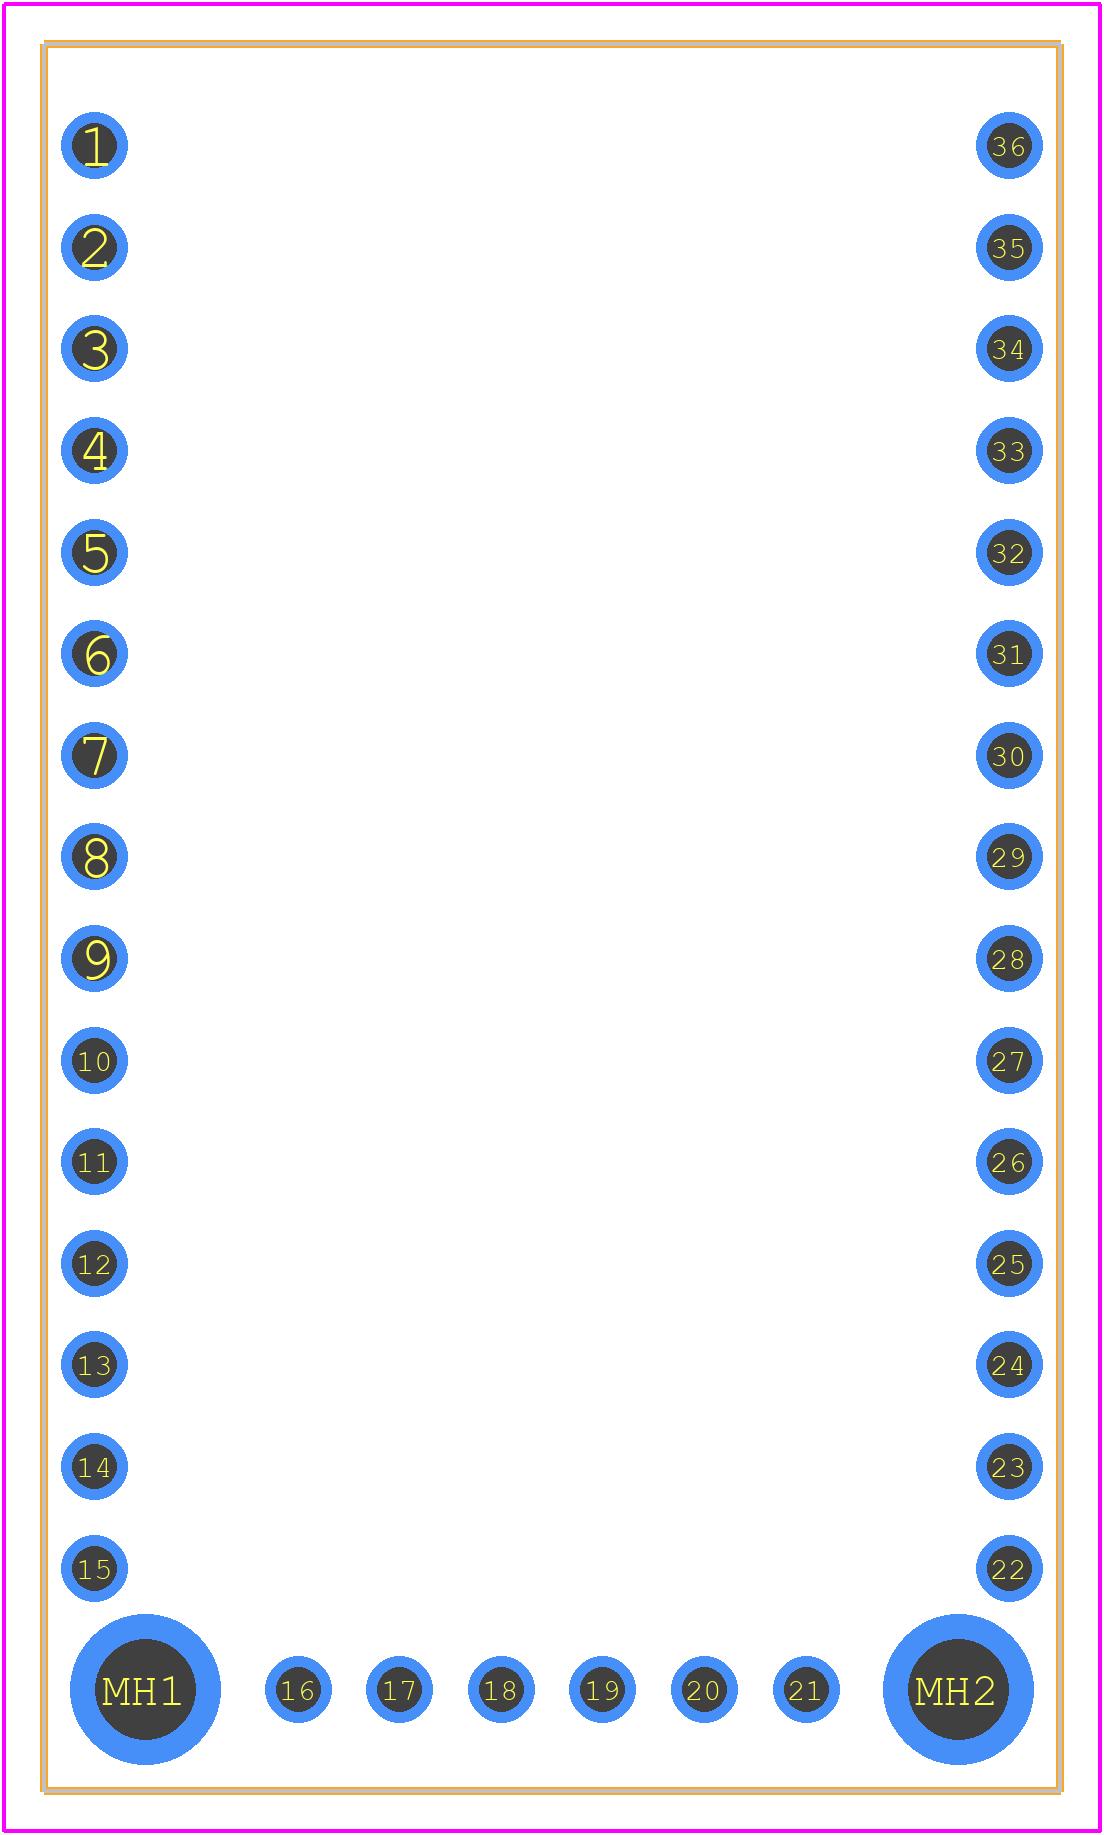 4172 - Adafruit PCB footprint - Other - 4172-3